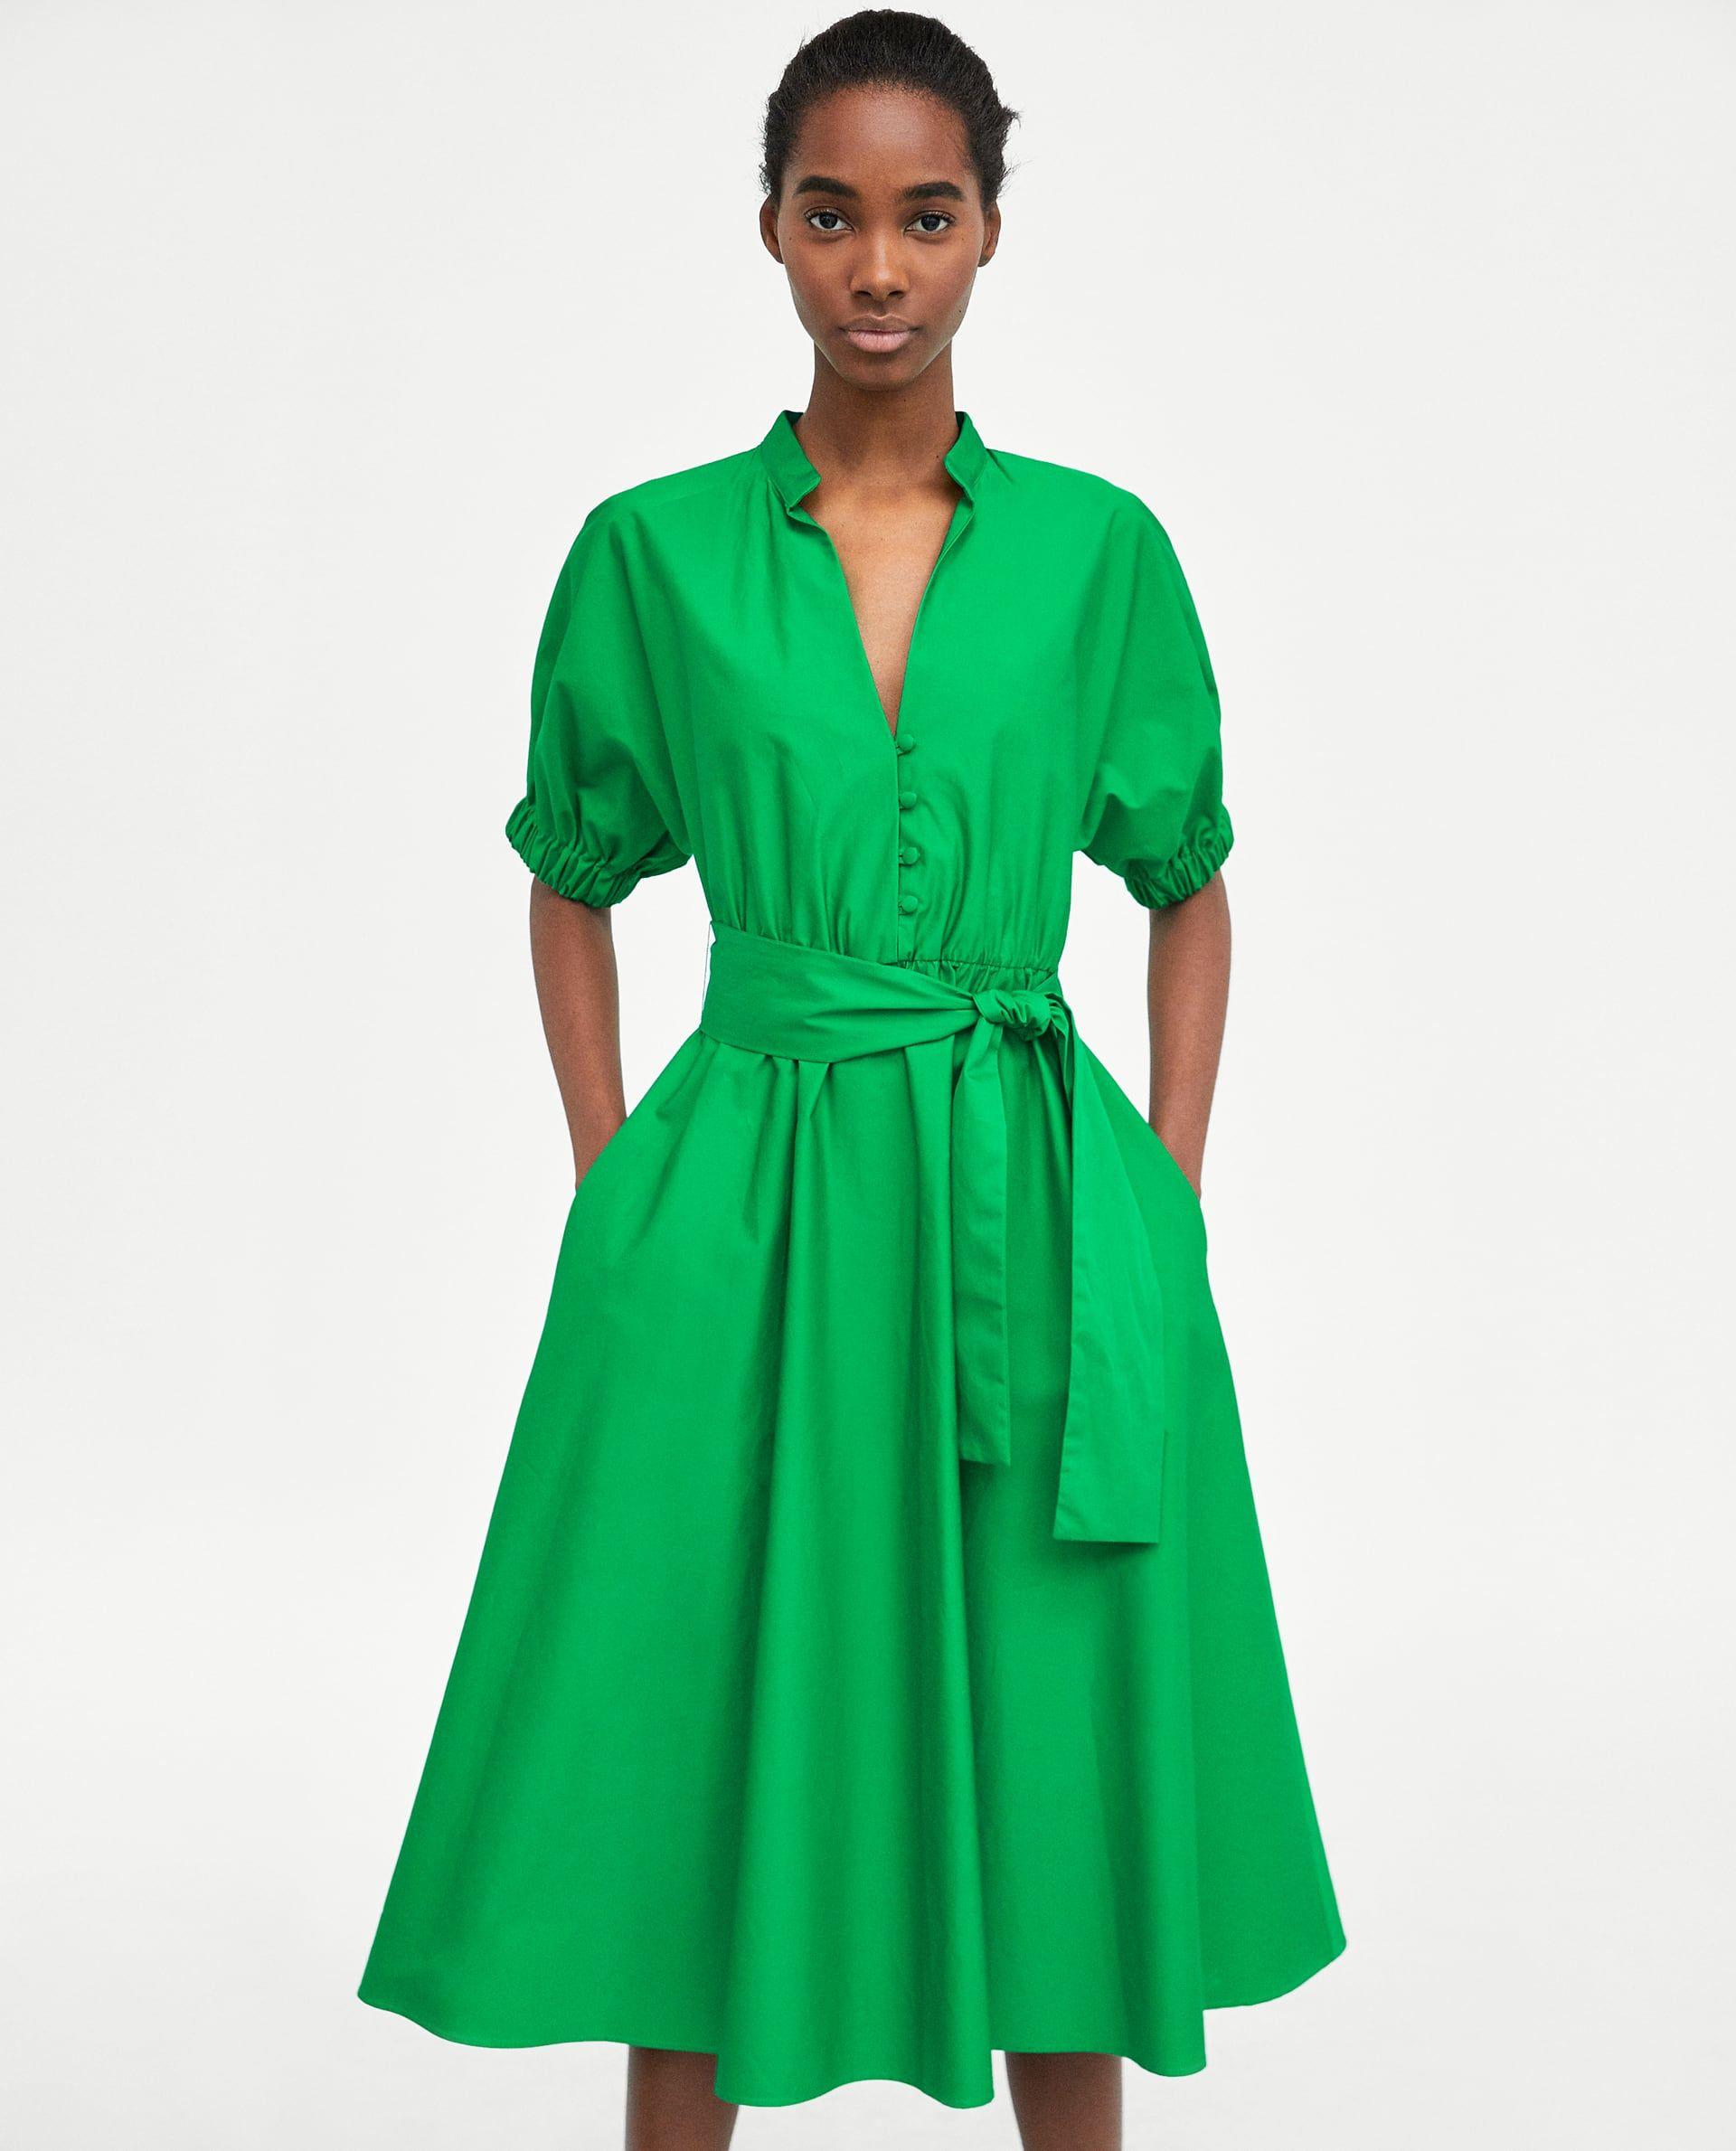 b85a4ecbb27 Women s Midi Dresses